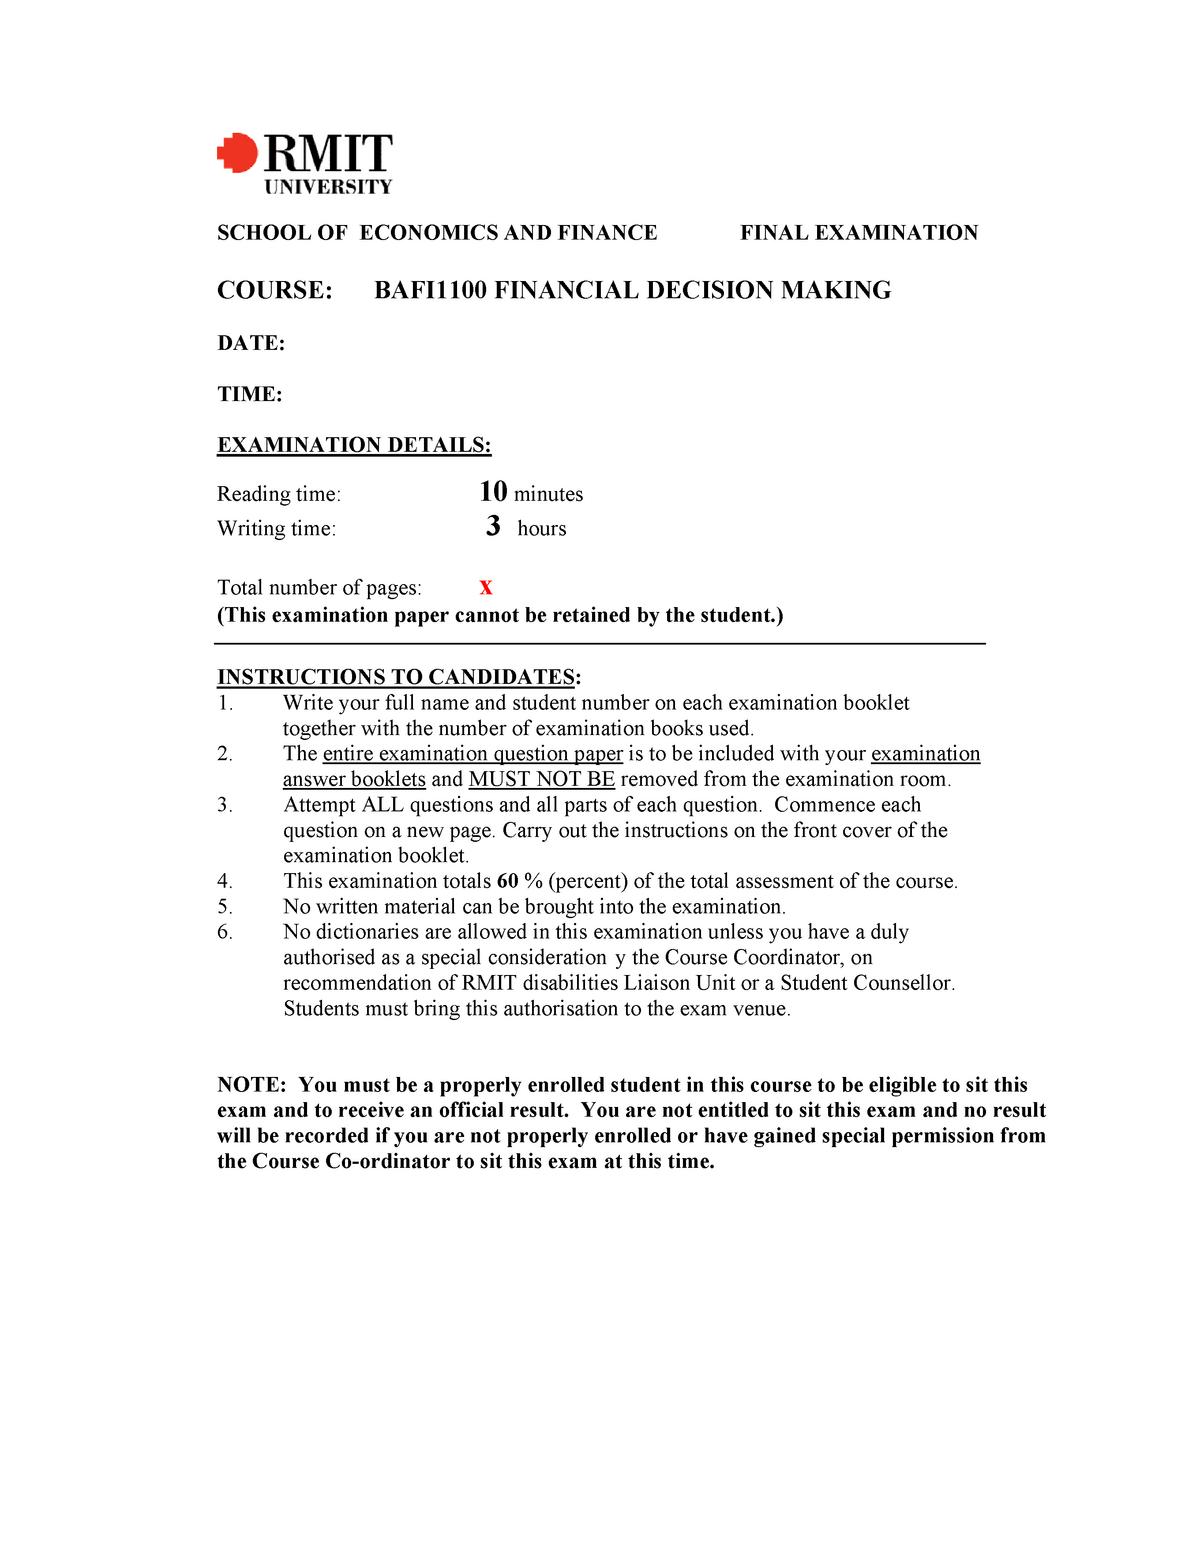 BAFI1100 guideline of final exam - BAFI2090 - StuDocu